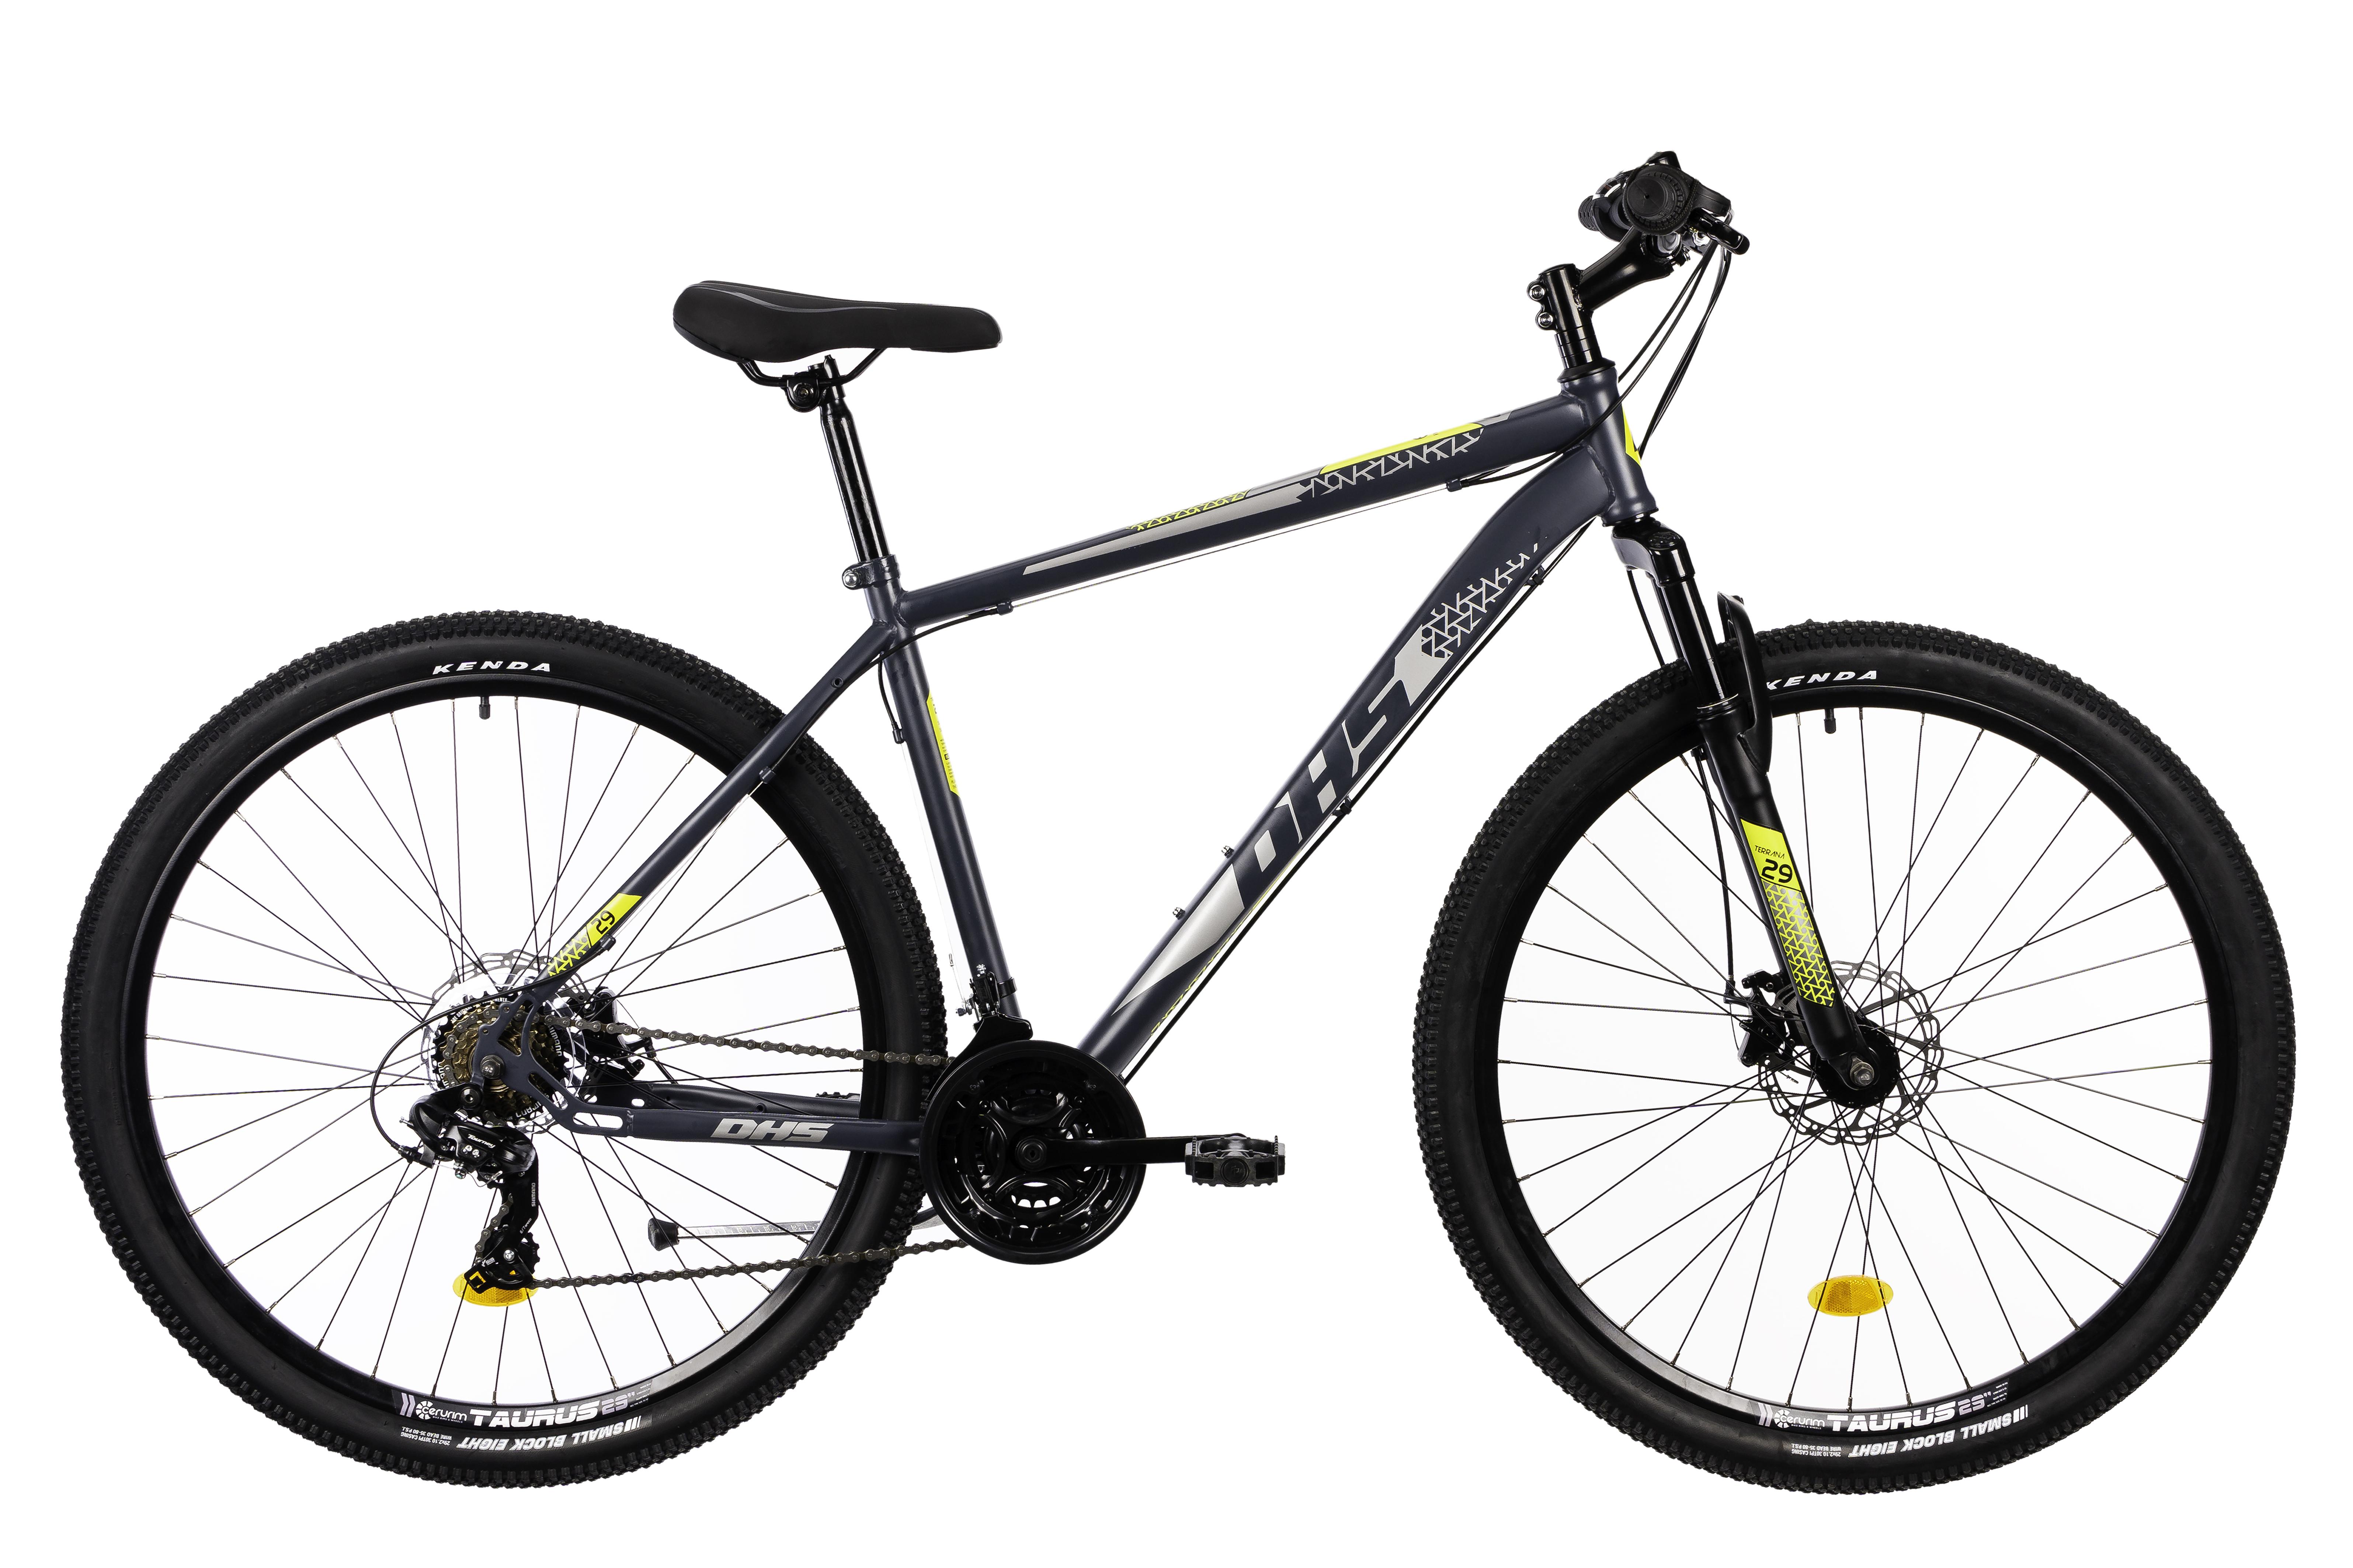 Bicicleta Mtb Terrana 2905 - 29 Inch, M, Gri [1]